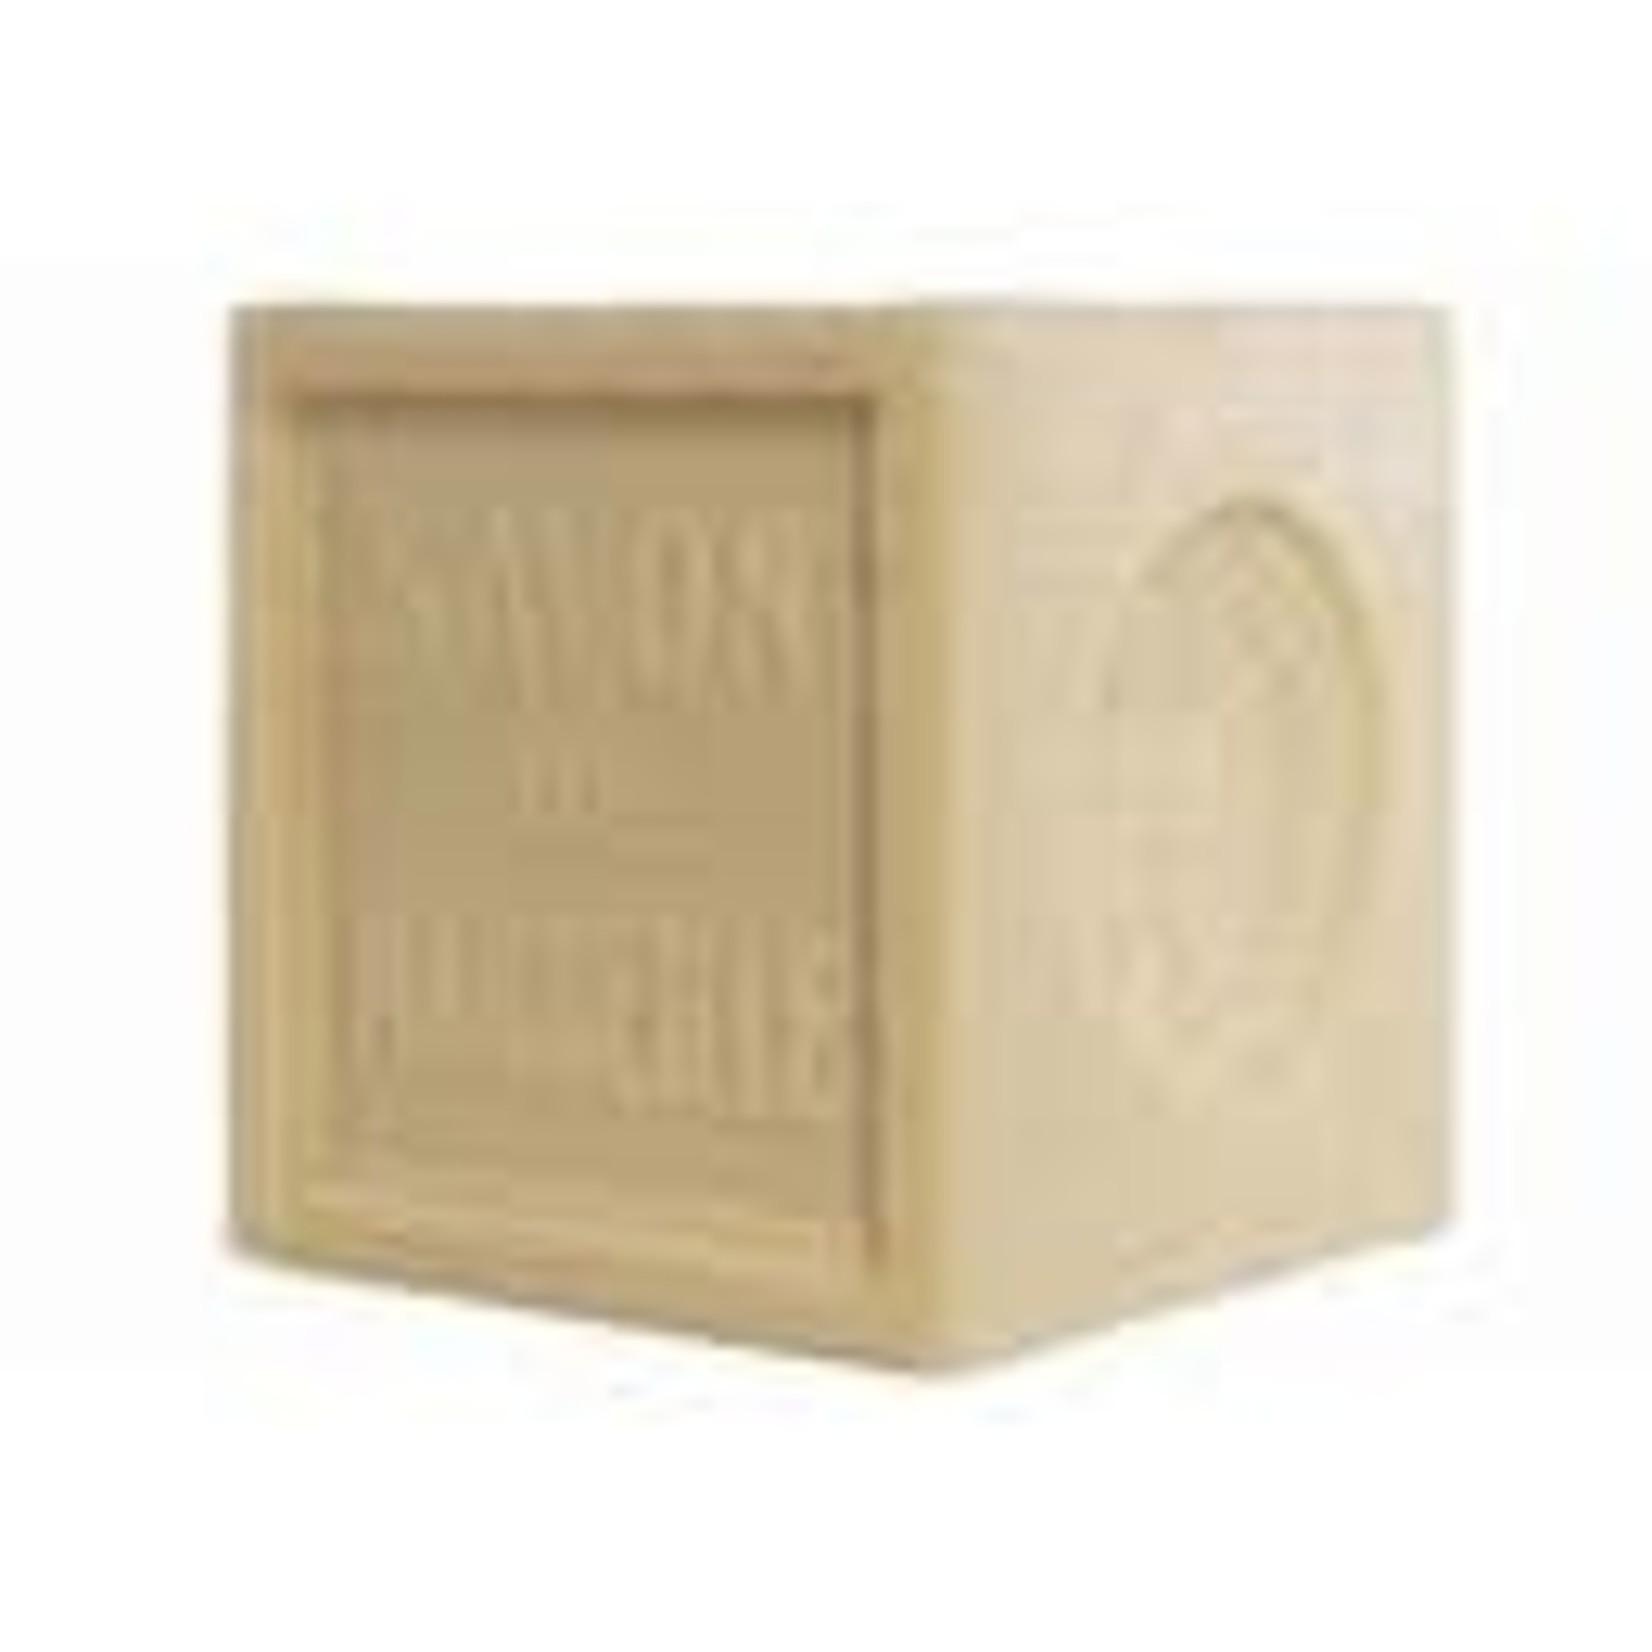 Marseille Soap Company Savon de Marseille – Unscented 10.59 Oz